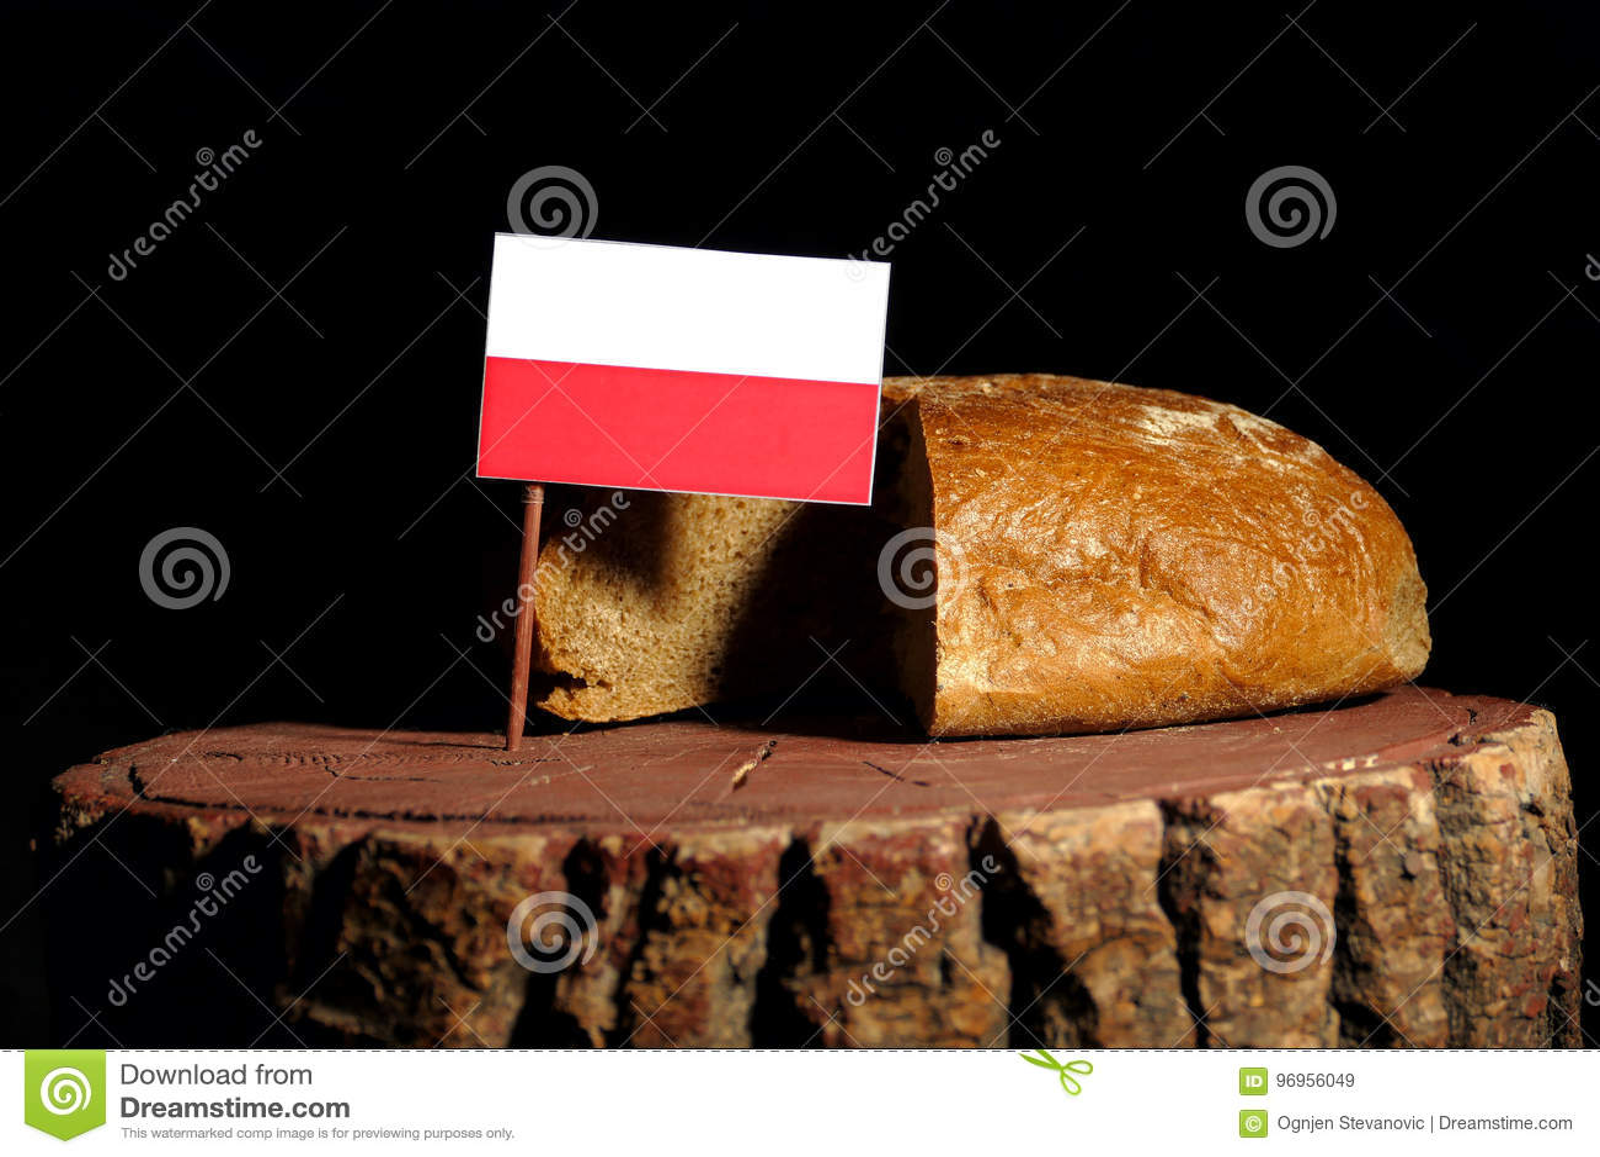 Polska flaga na fiszorku z chlebem